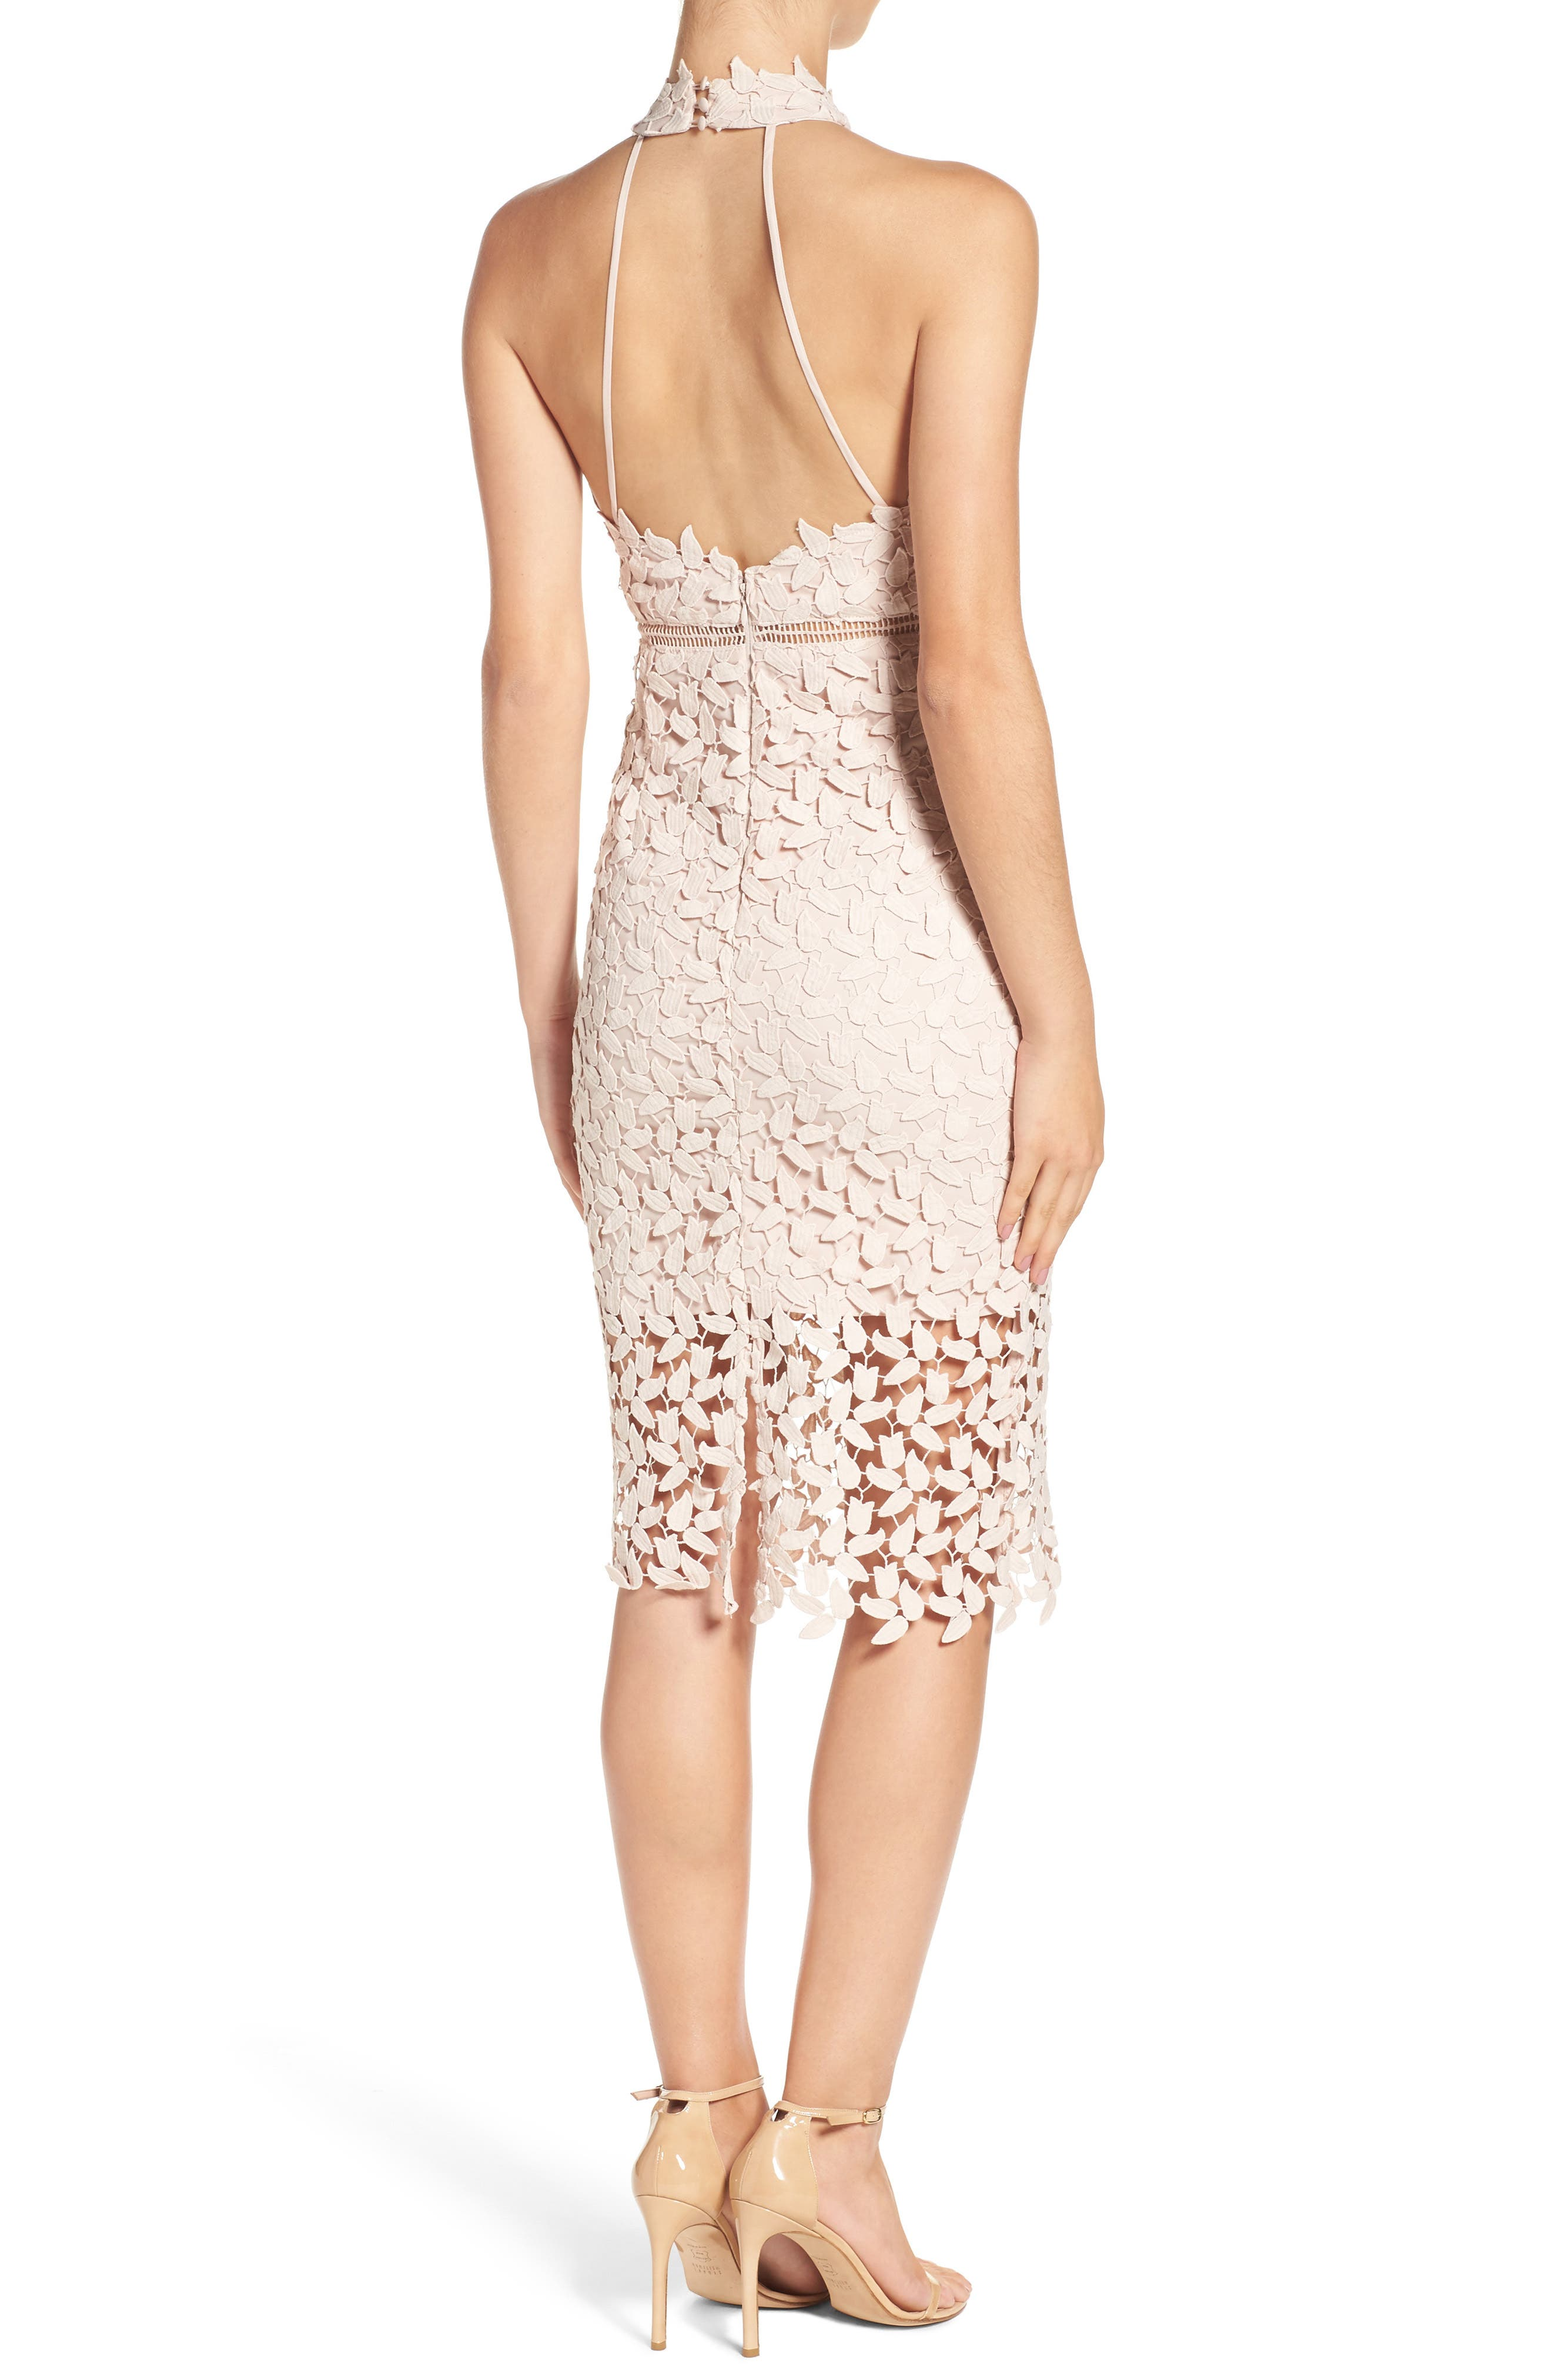 BARDOT, Gemma Halter Lace Sheath Dress, Alternate thumbnail 2, color, PROSECCO